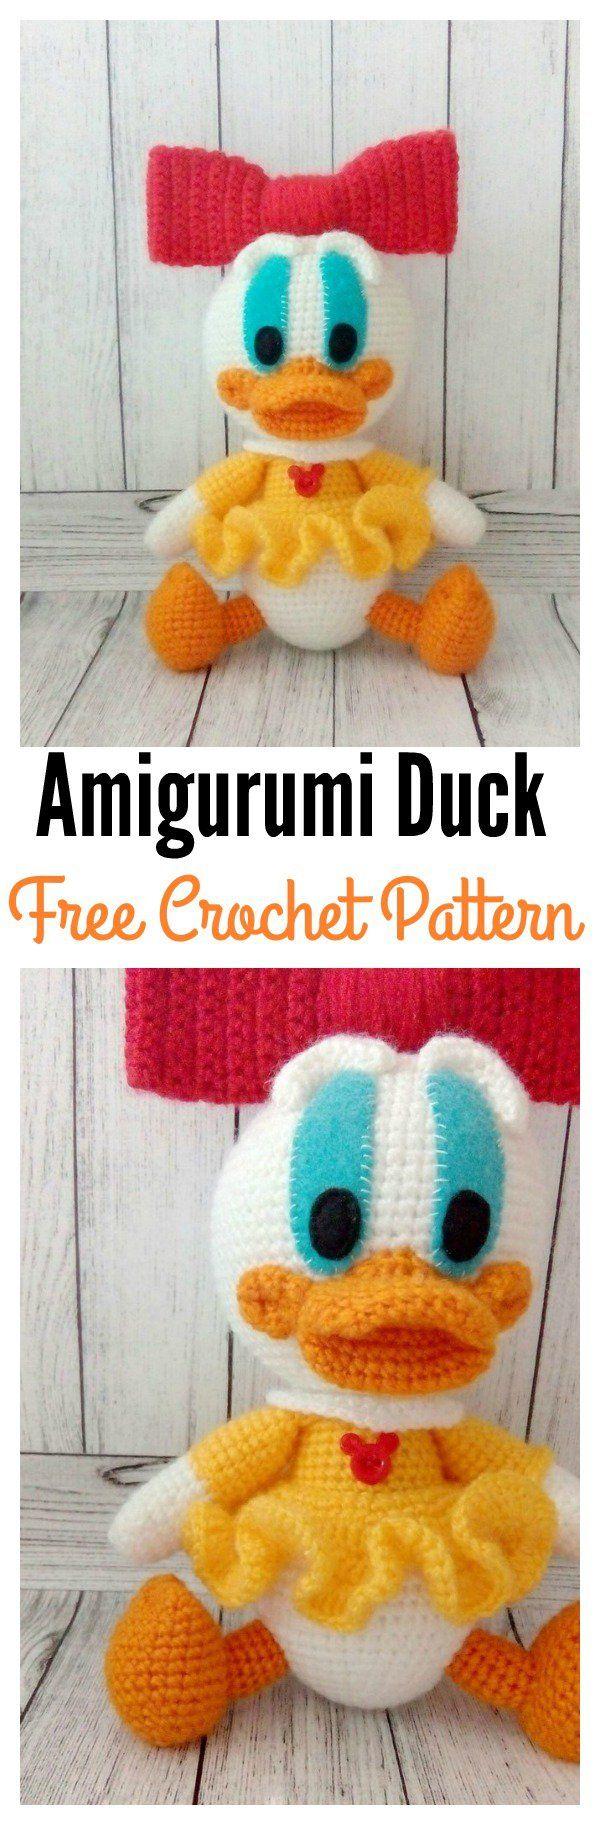 Amigurumi Duck Free Crochet PatternAmigurumi Duck Free Crochet Pattern